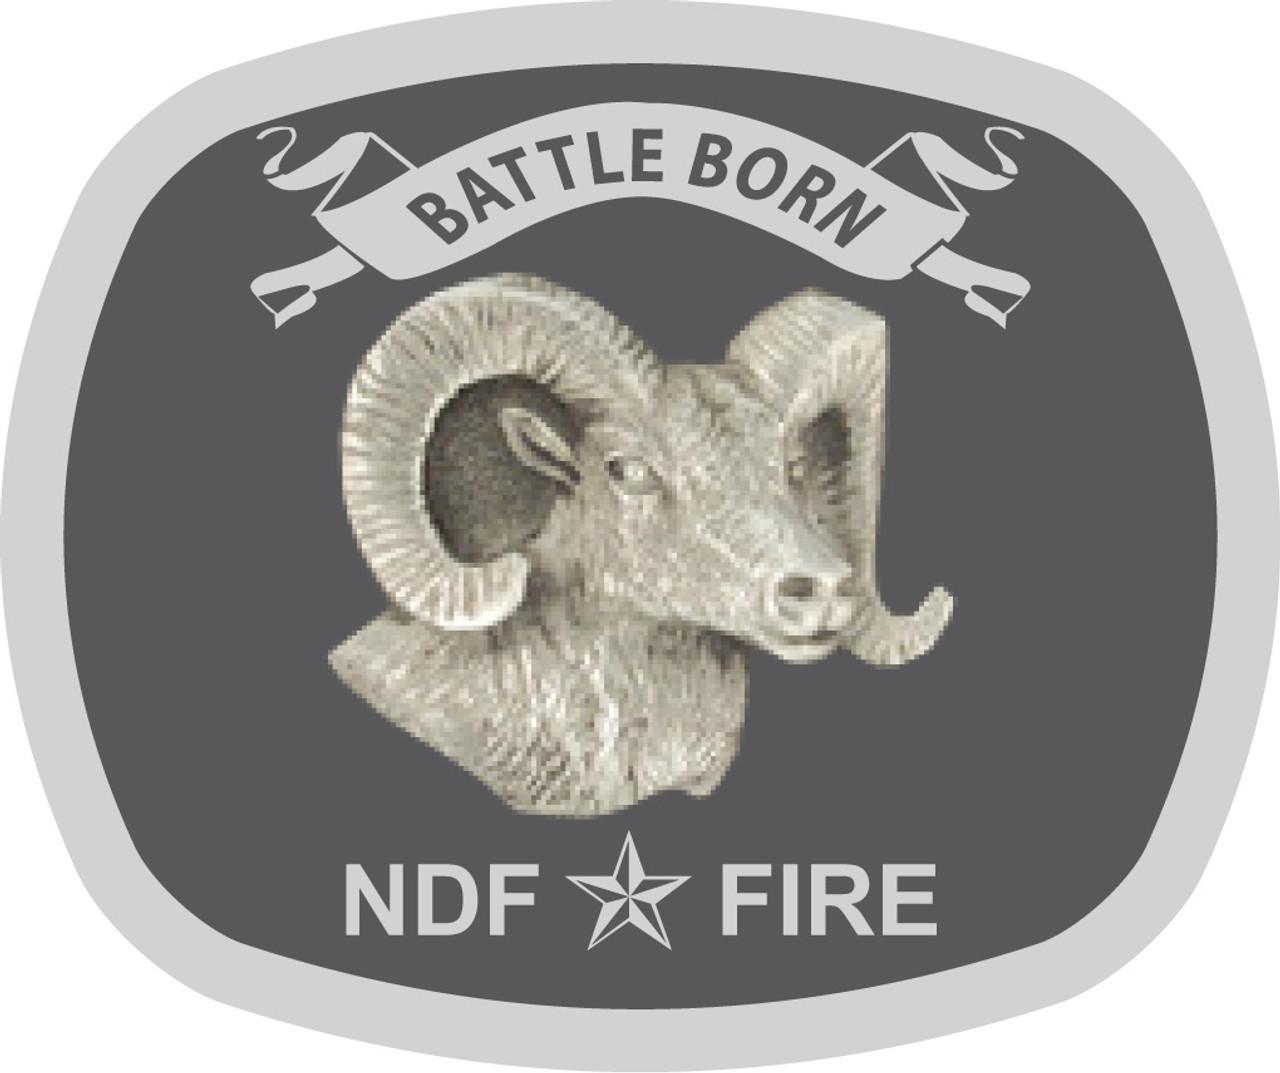 Battle Born NDF Fire Belt Buckle